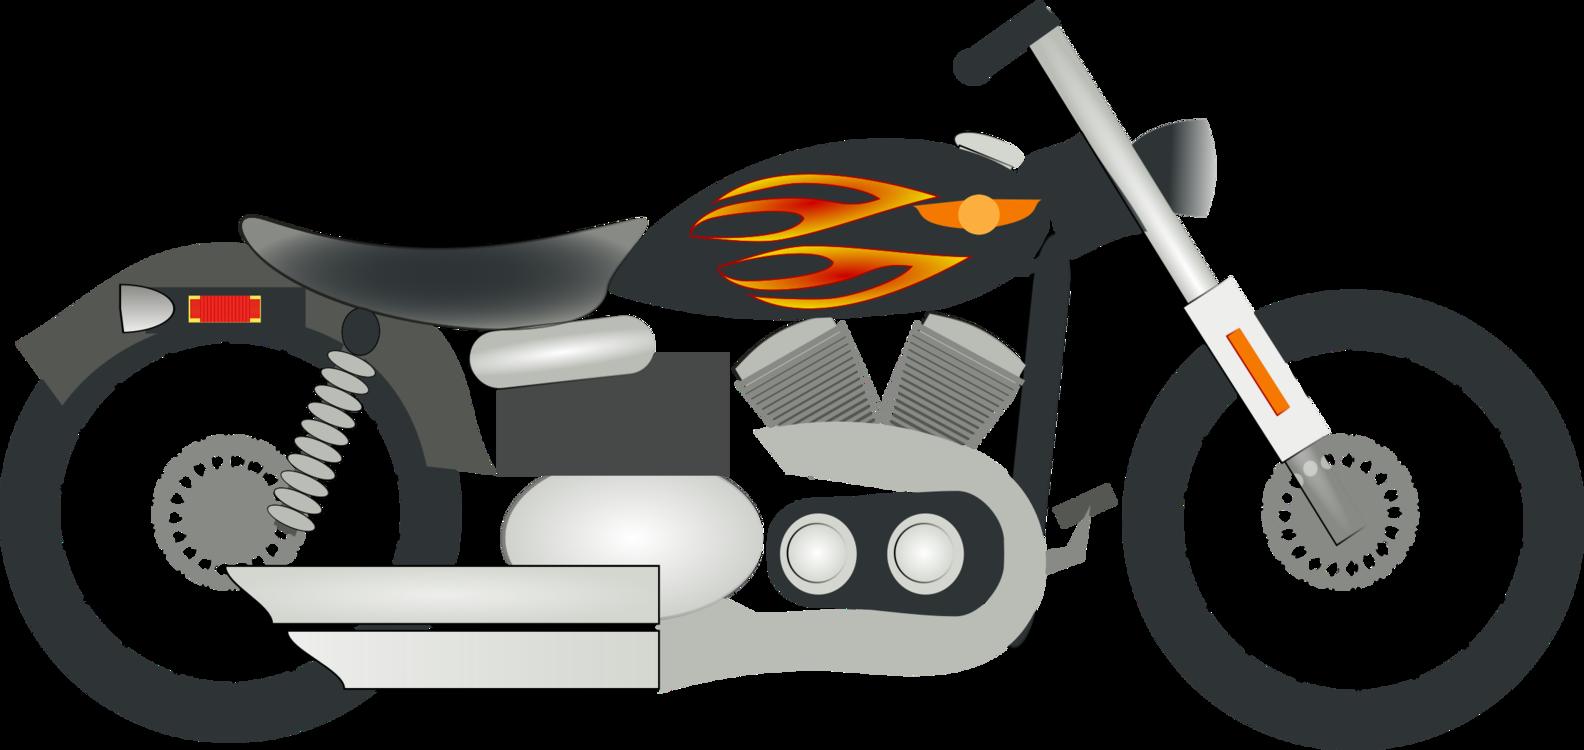 Wheel,Bicycle Accessory,Spoke